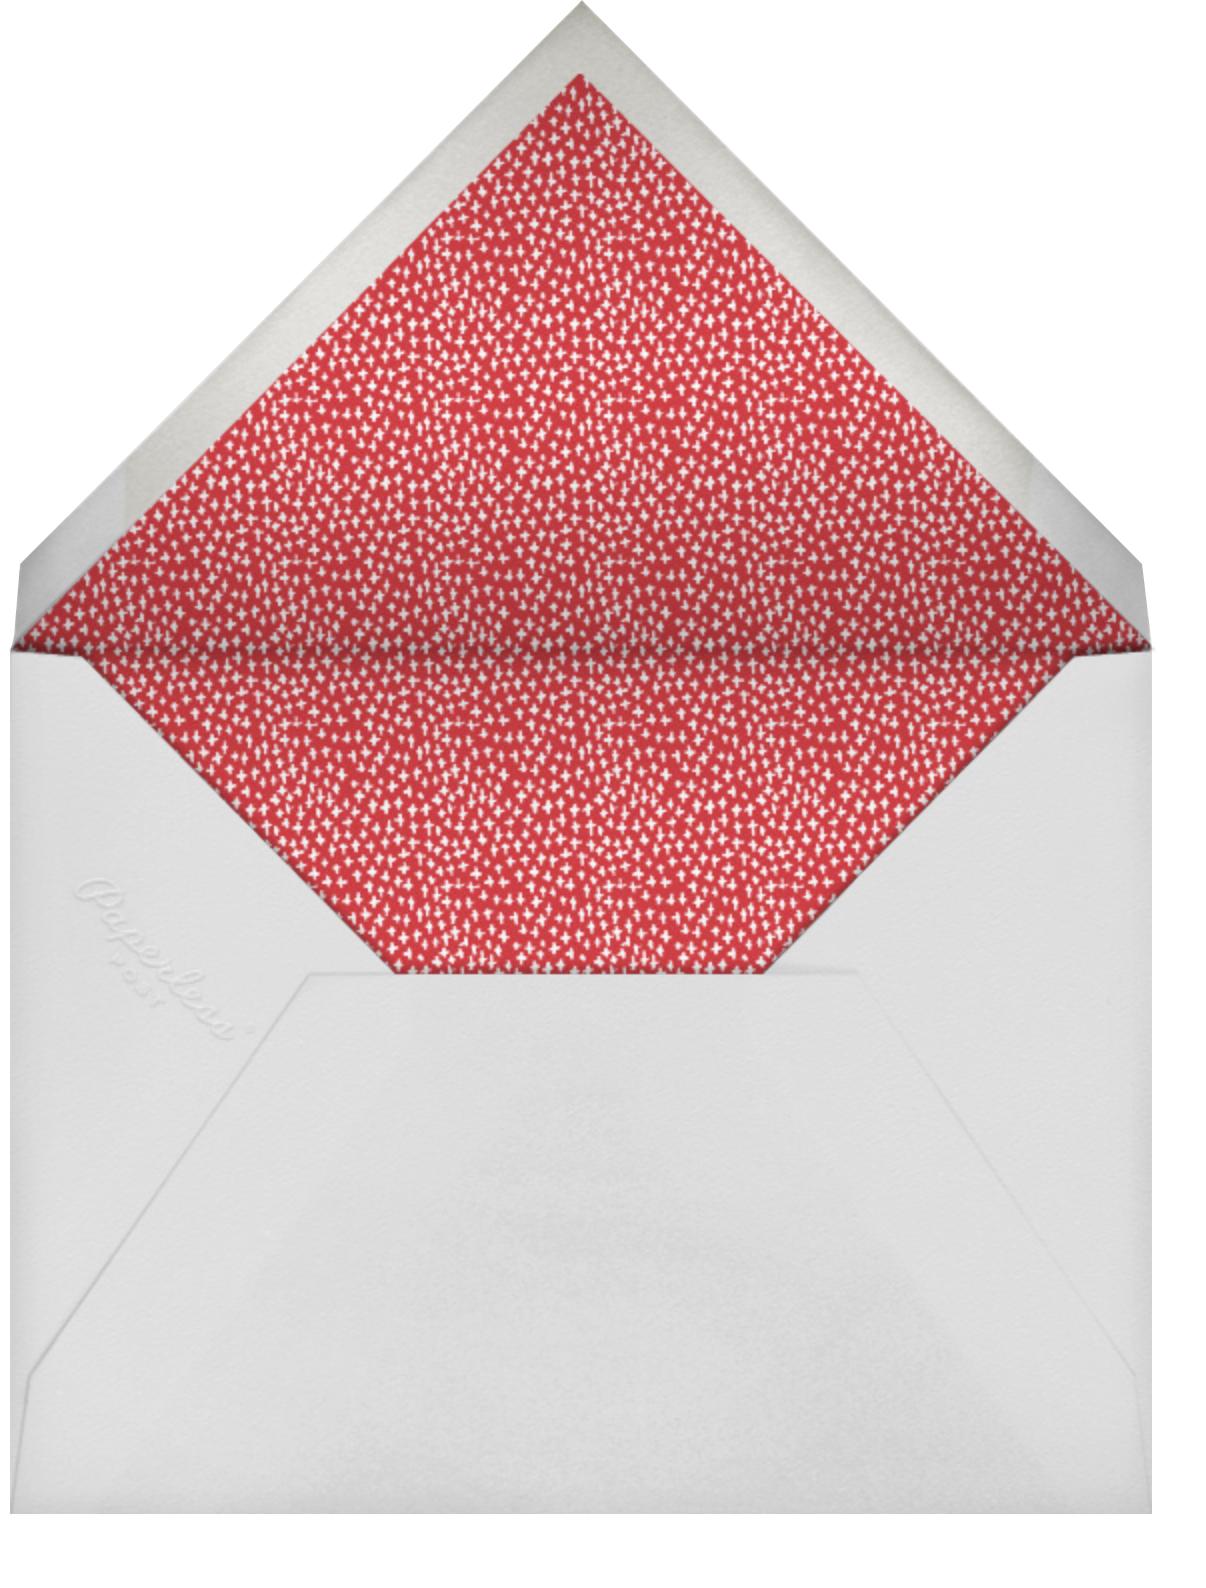 Holiday Pit Stop - Fair - Mr. Boddington's Studio - Envelope